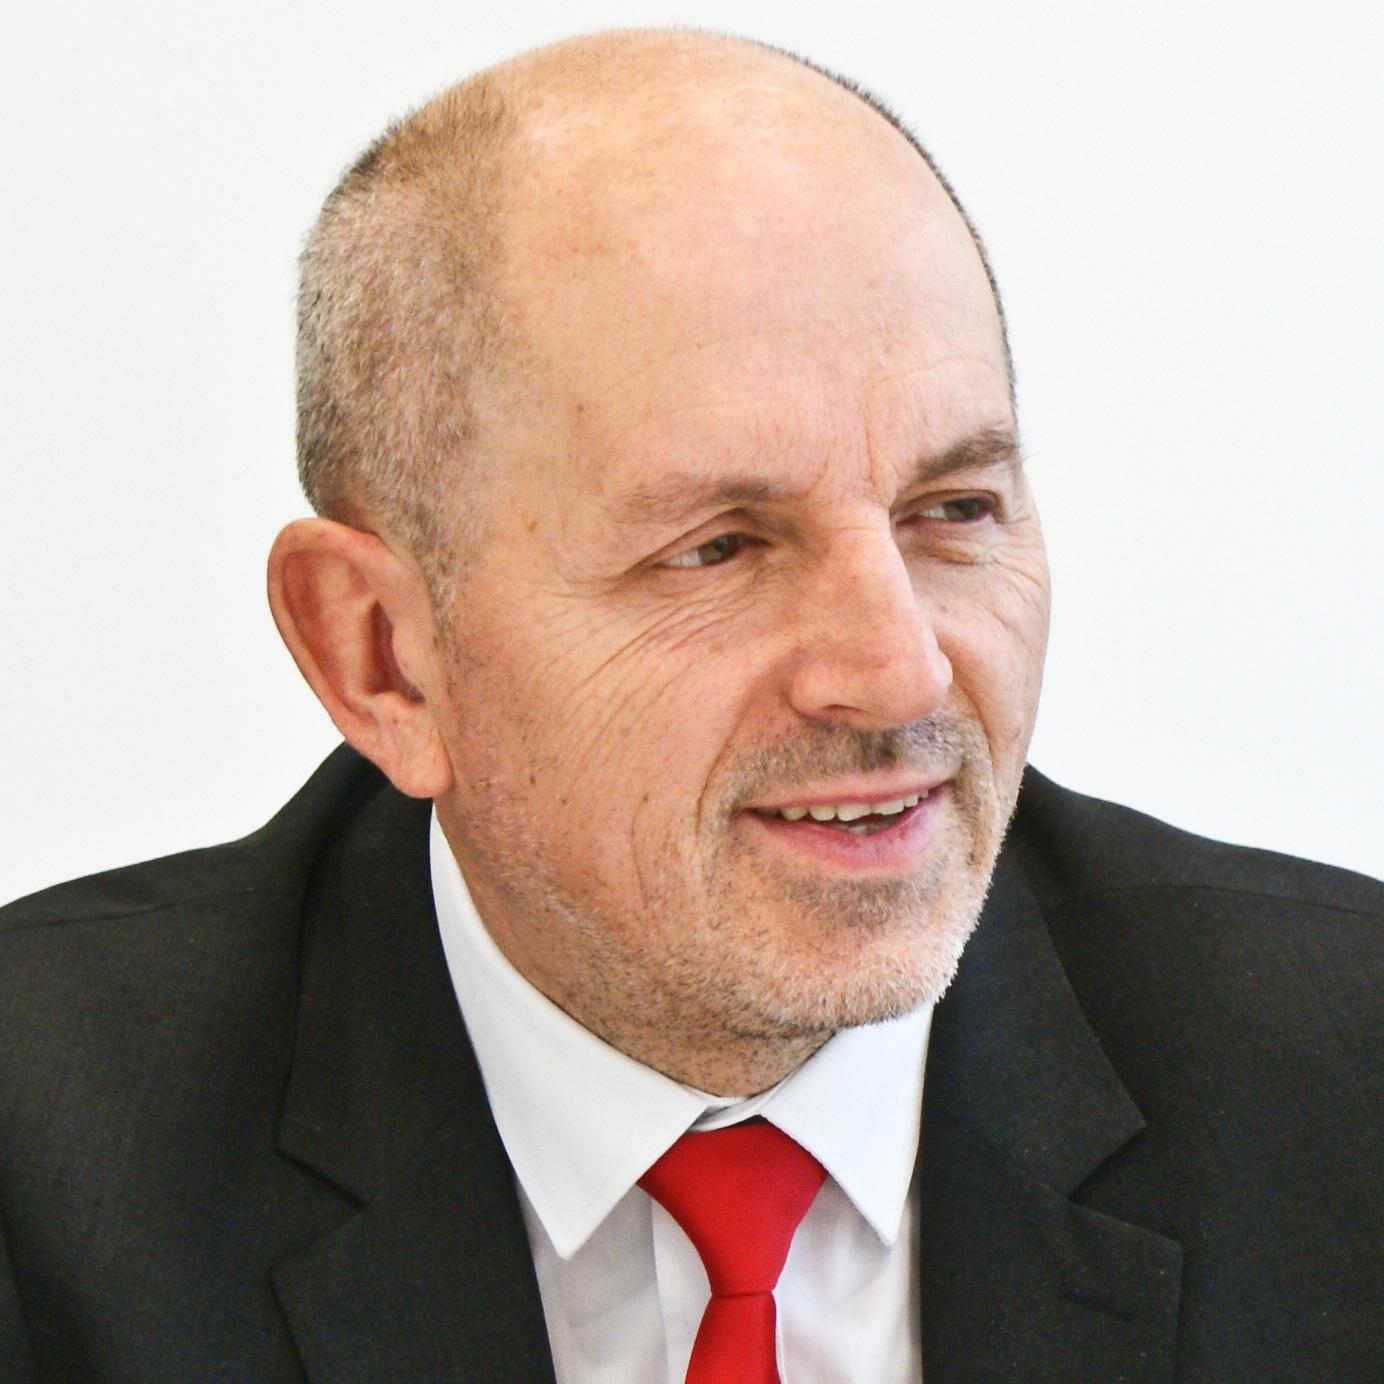 Martin Morháč